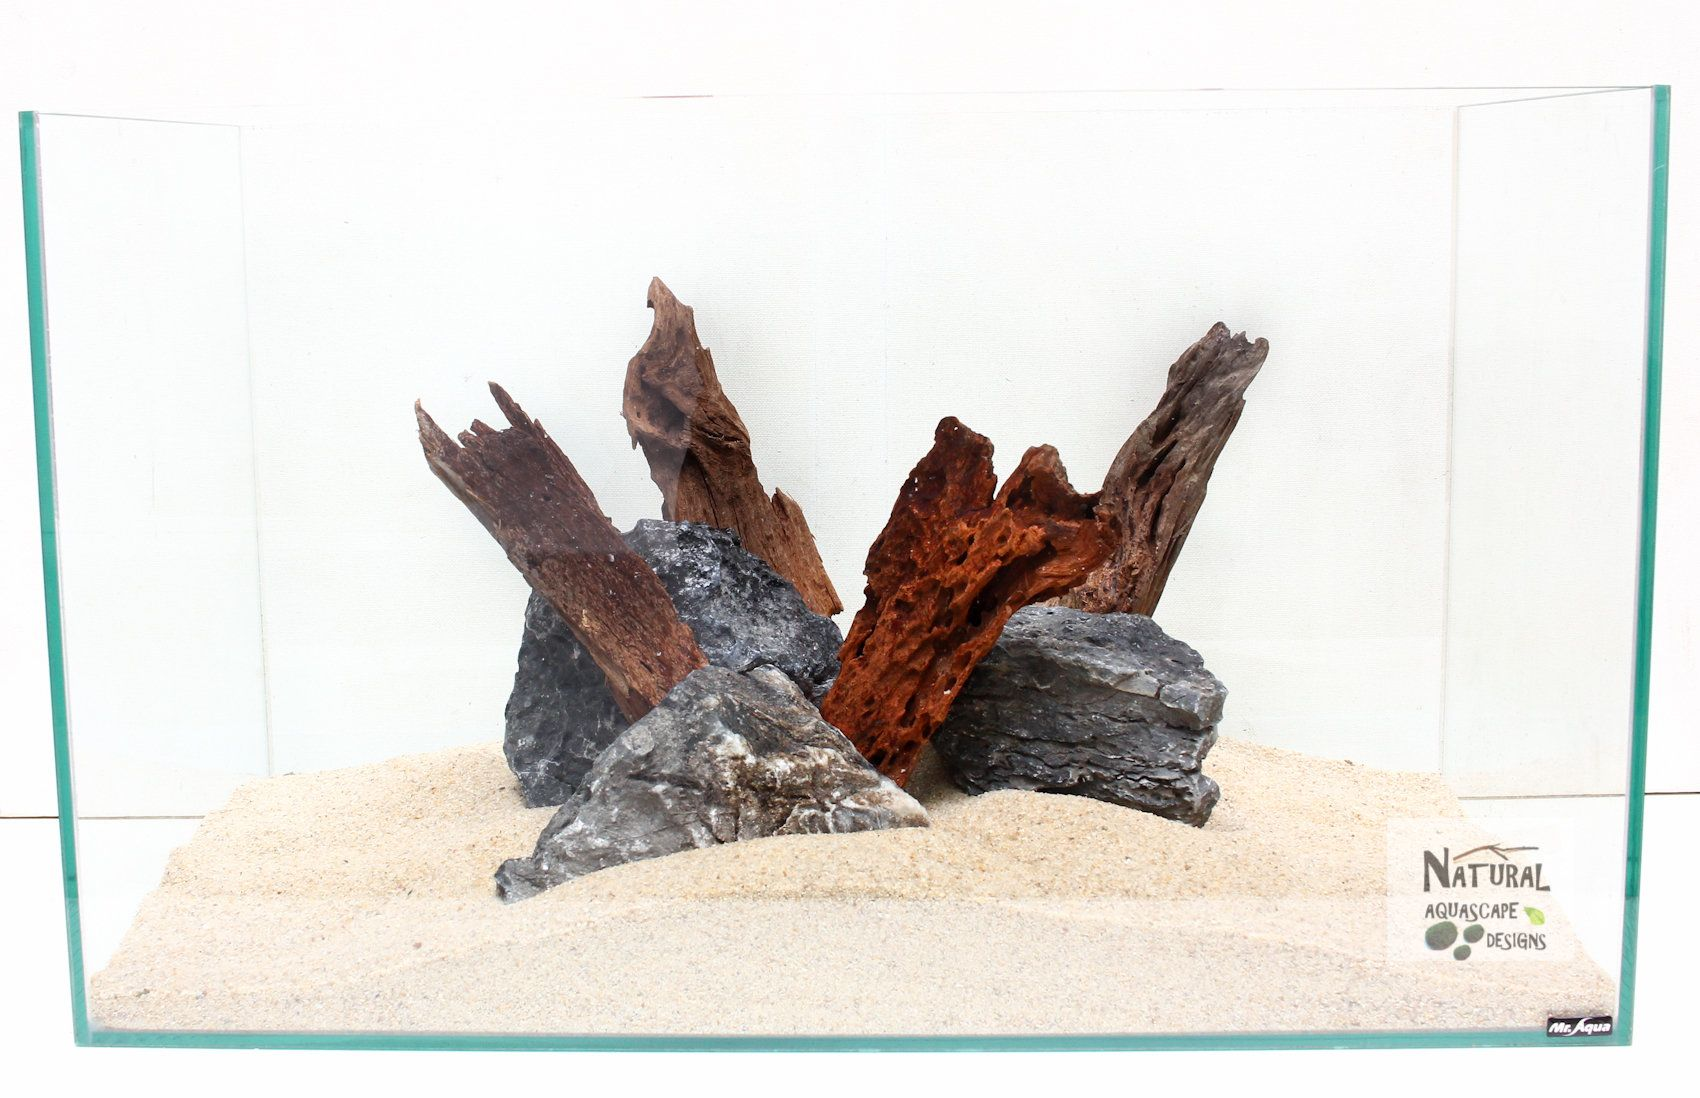 Marina Naturals Malaysian Driftwood with Plants